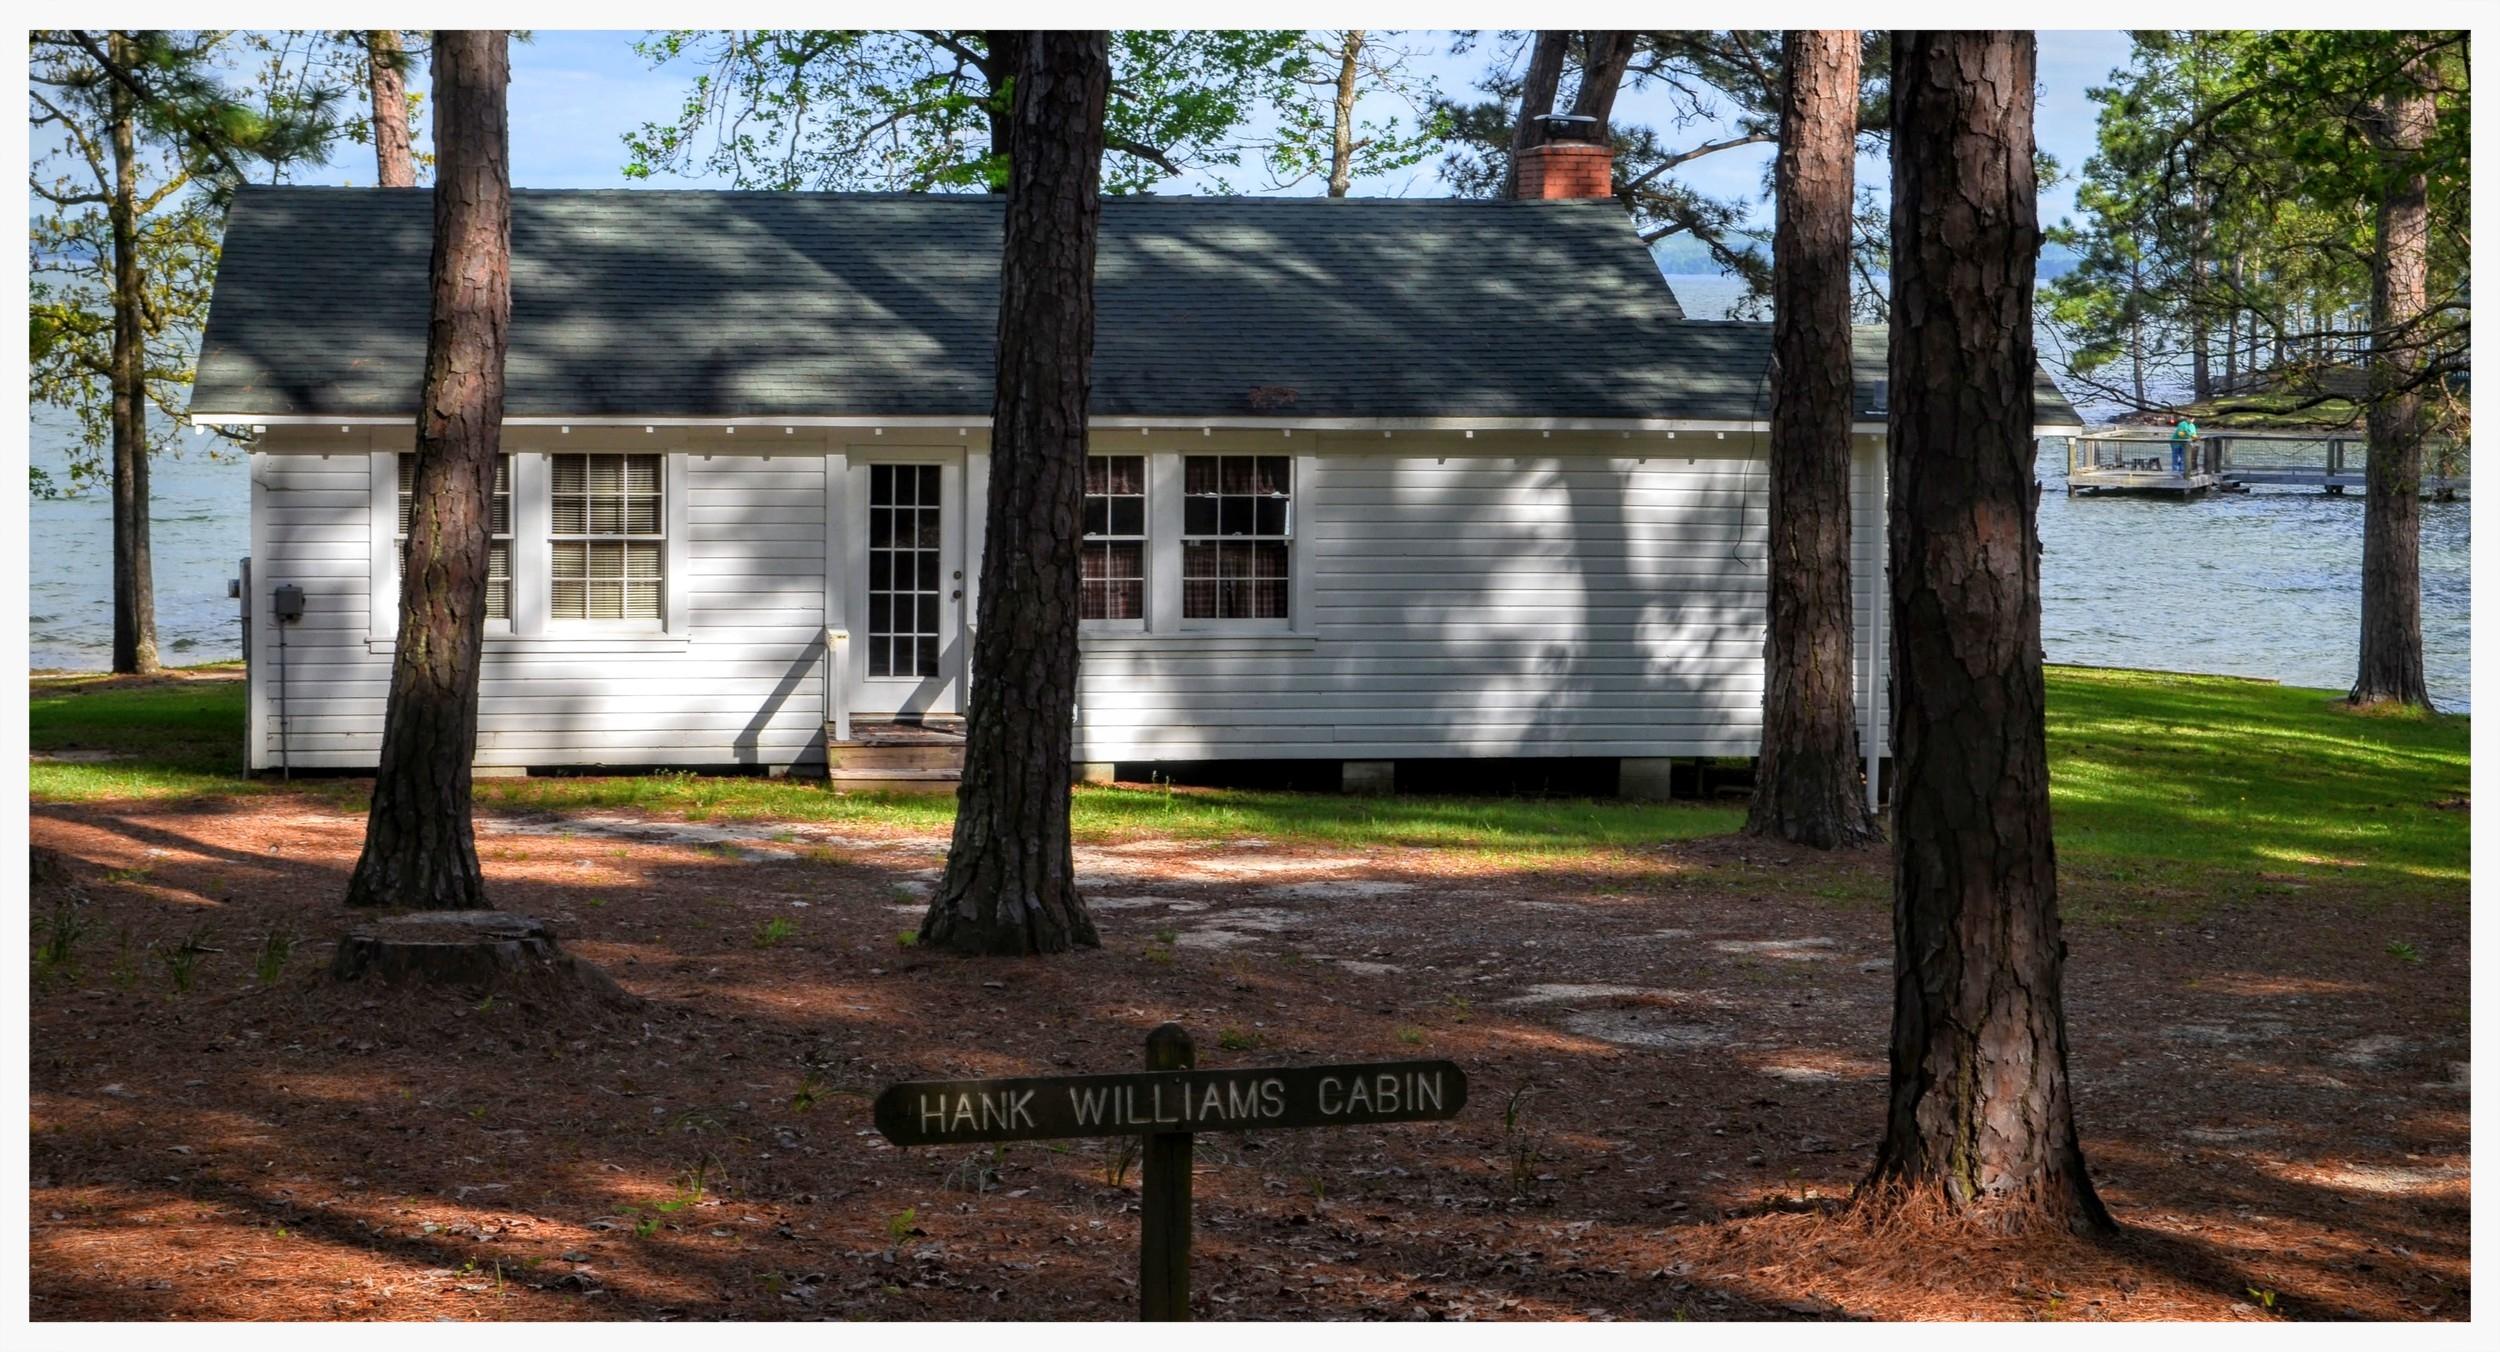 Hank Williams Cabin, Children's Harbor, Eclectic, Elmore County, Alabama